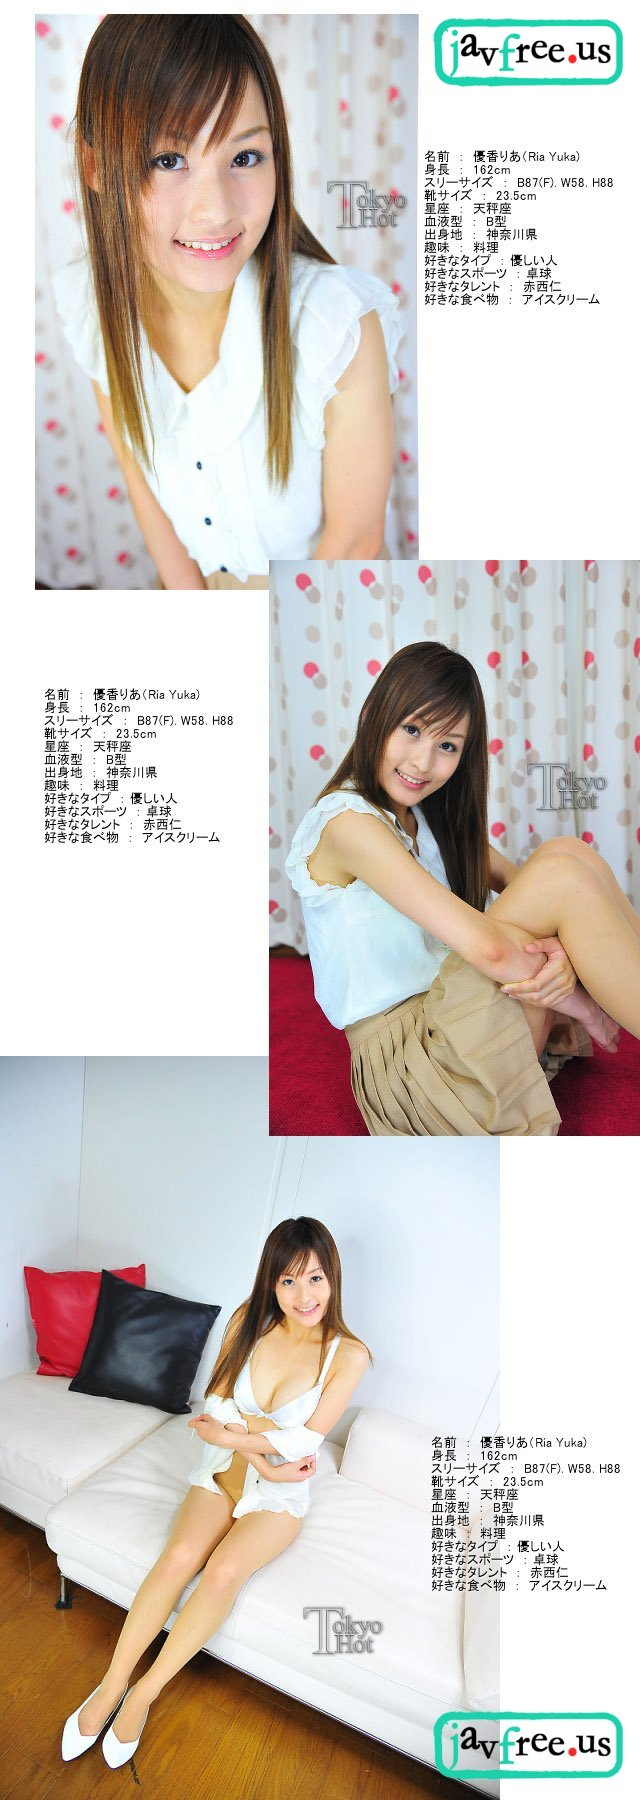 Tokyo Hot n0669 : Pussy Receptionist   Ria Yuka 優香りあ Tokyo Hot Ria Yuka